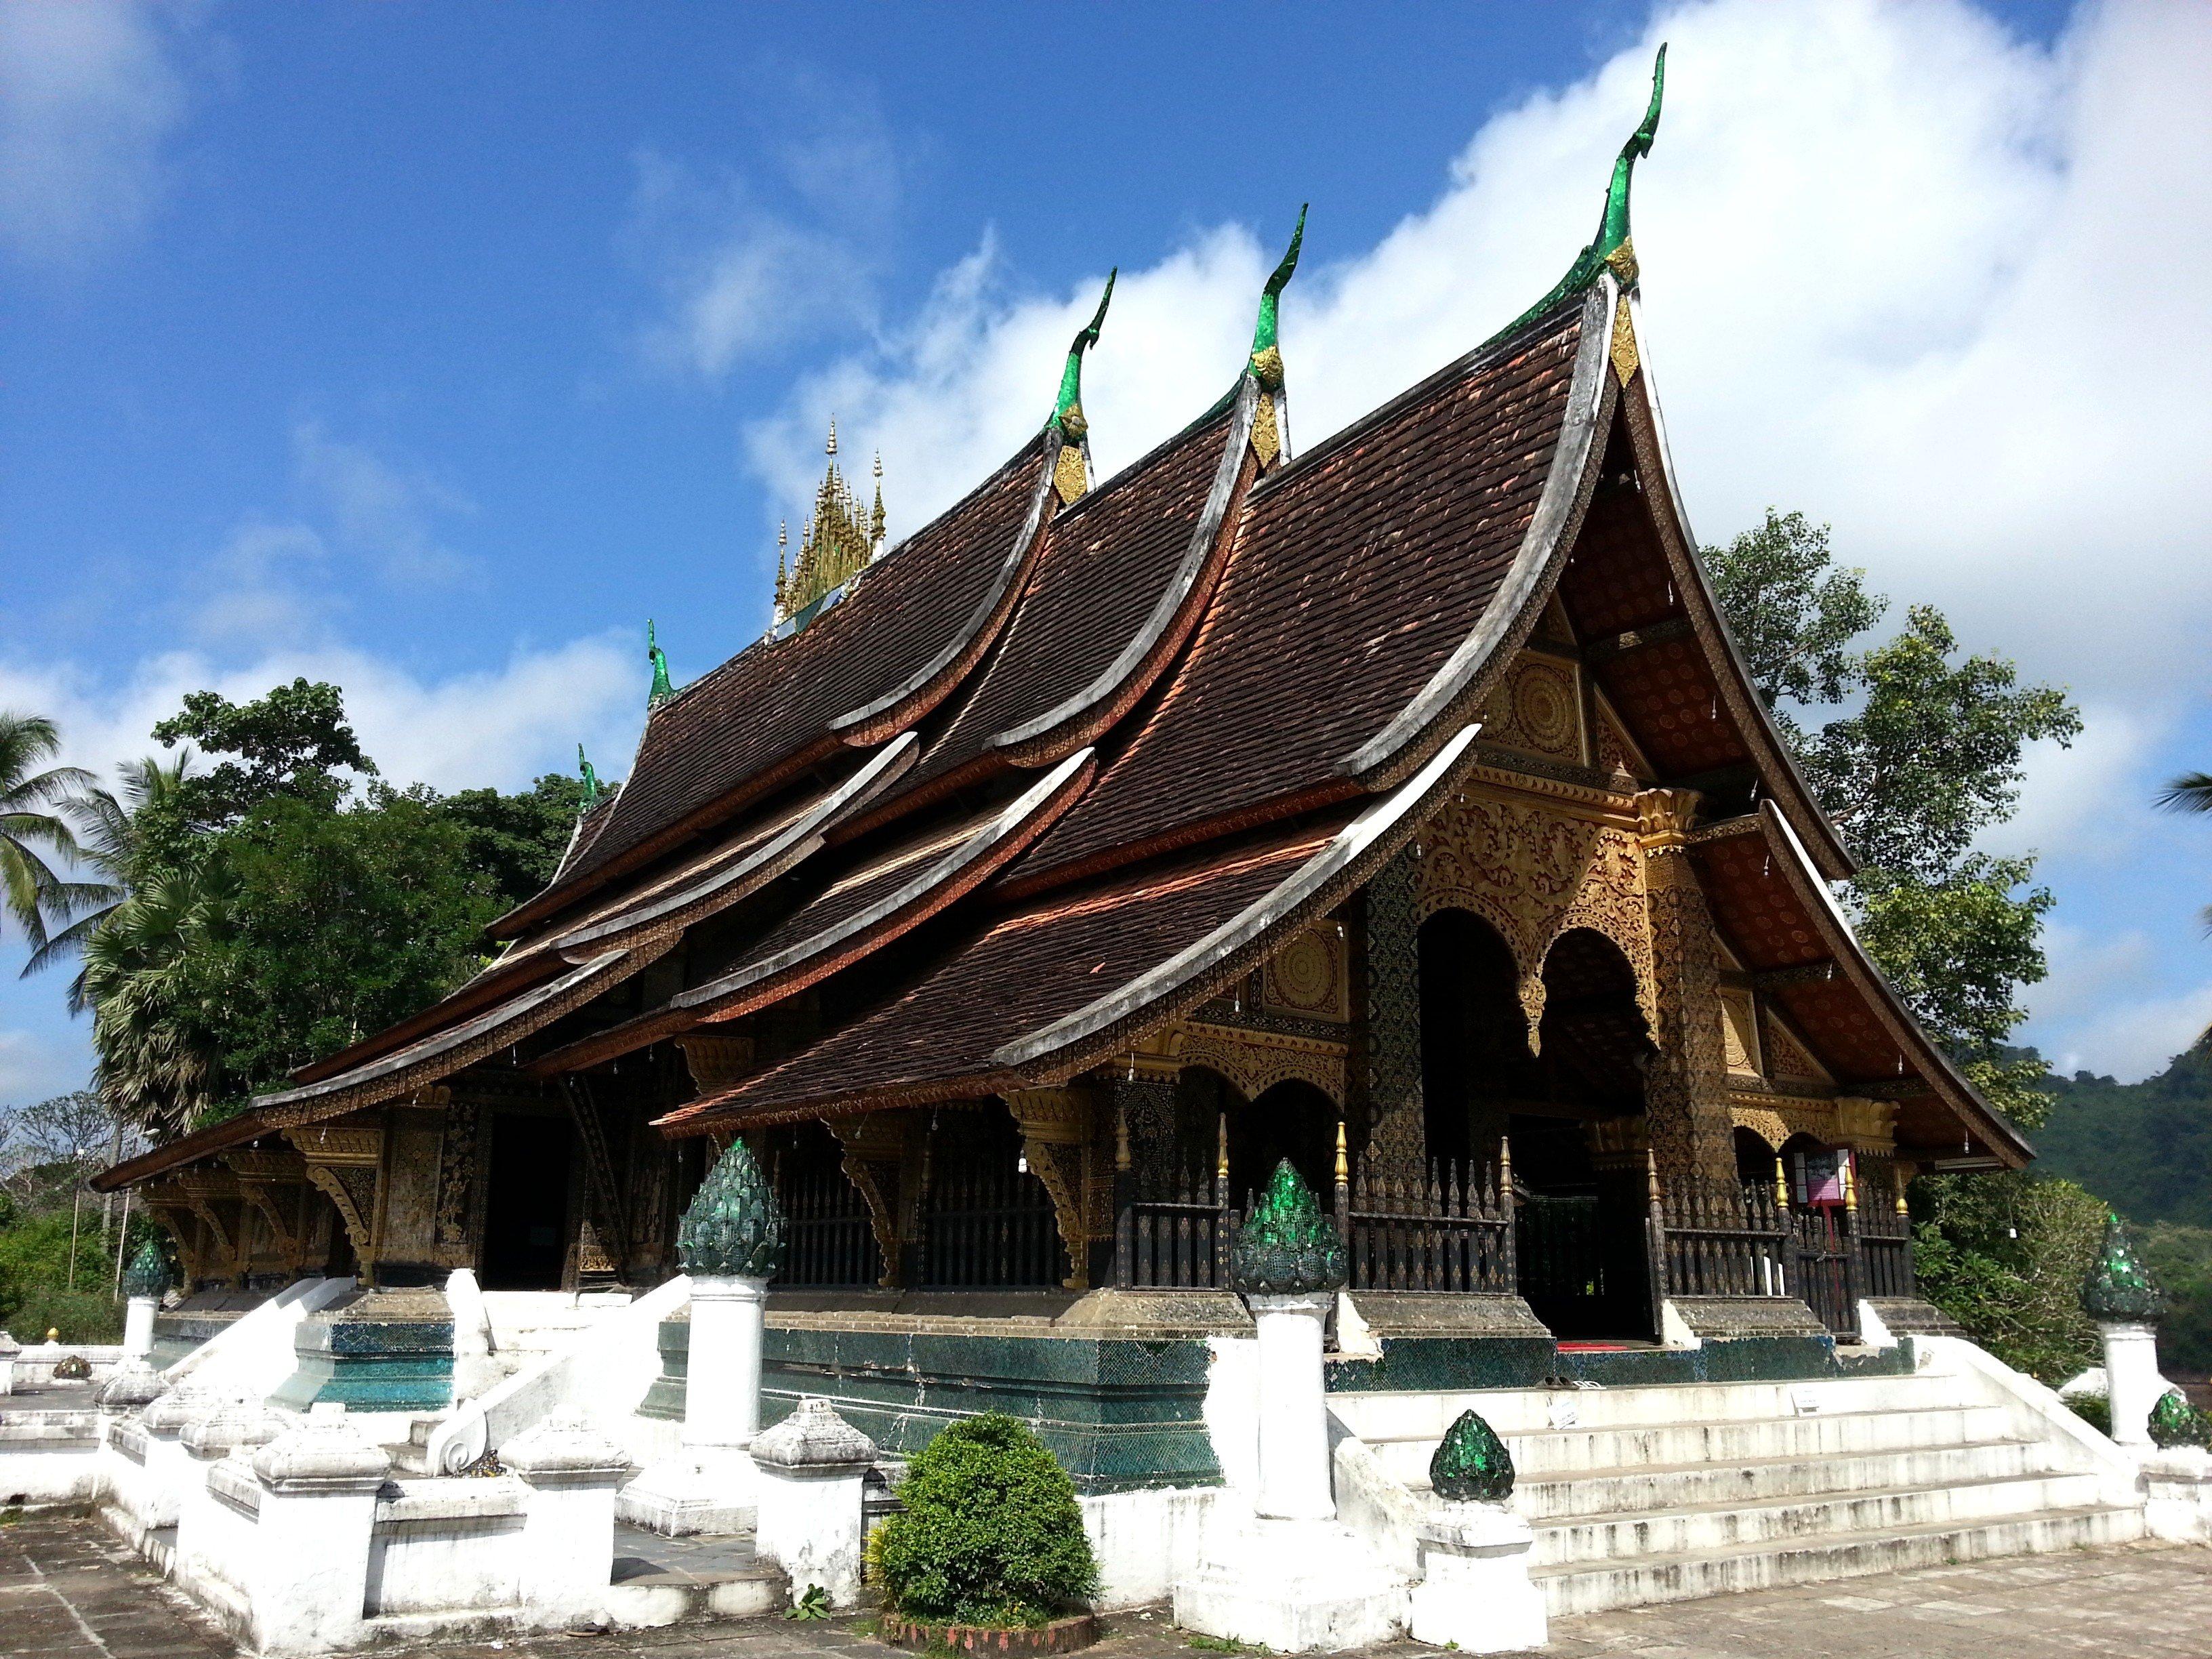 Xieng Thong Temple in Luang Prabang